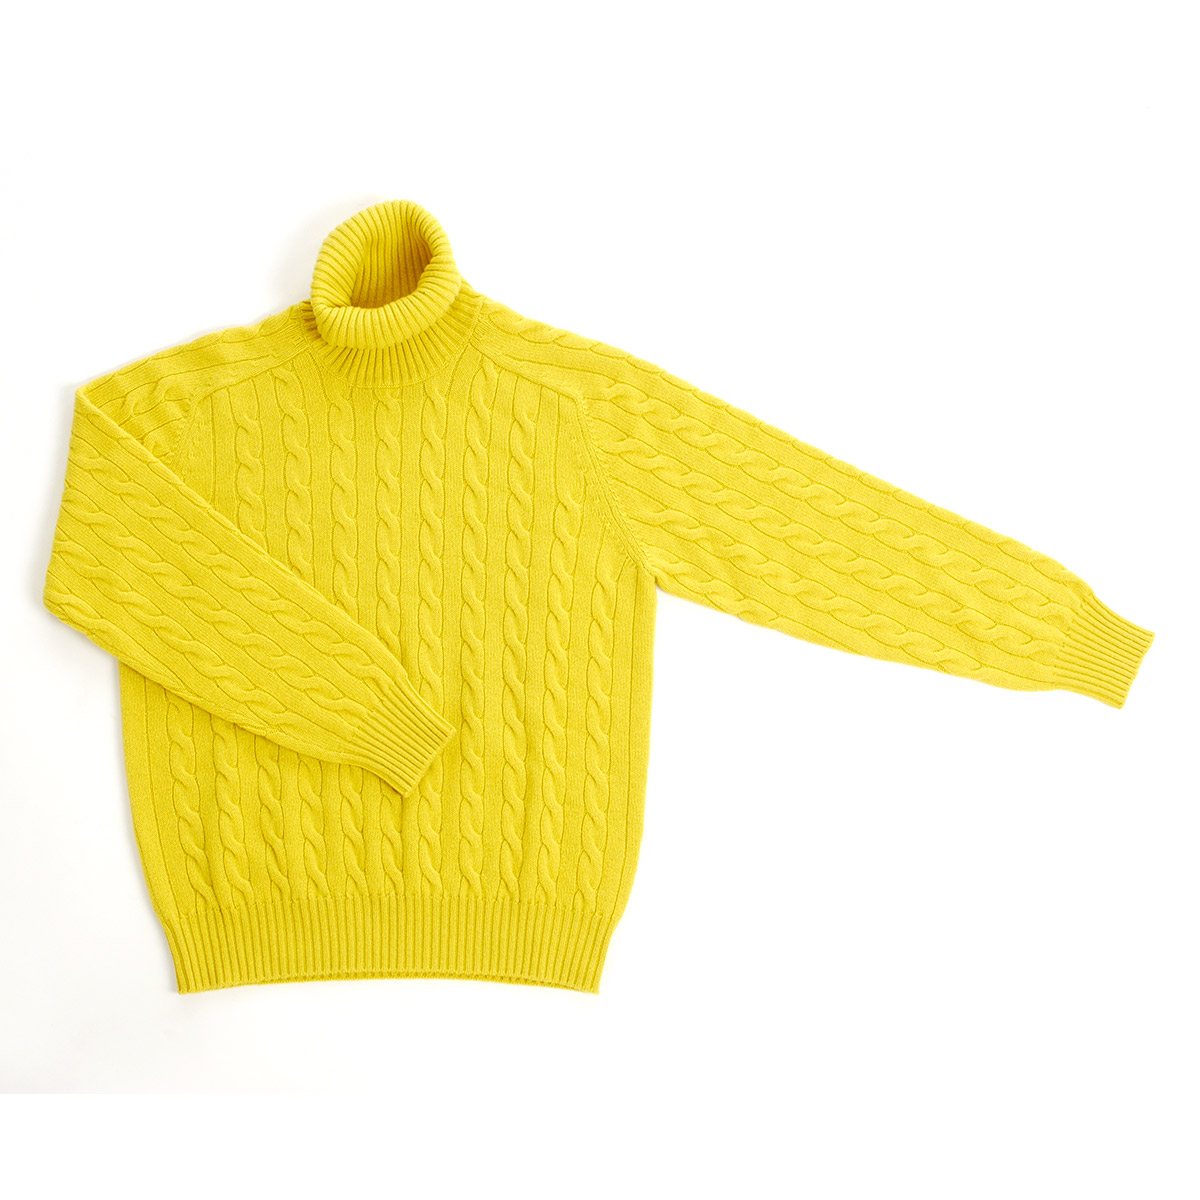 Maglia Sir Wilson – dolcevita cashmere – giallo